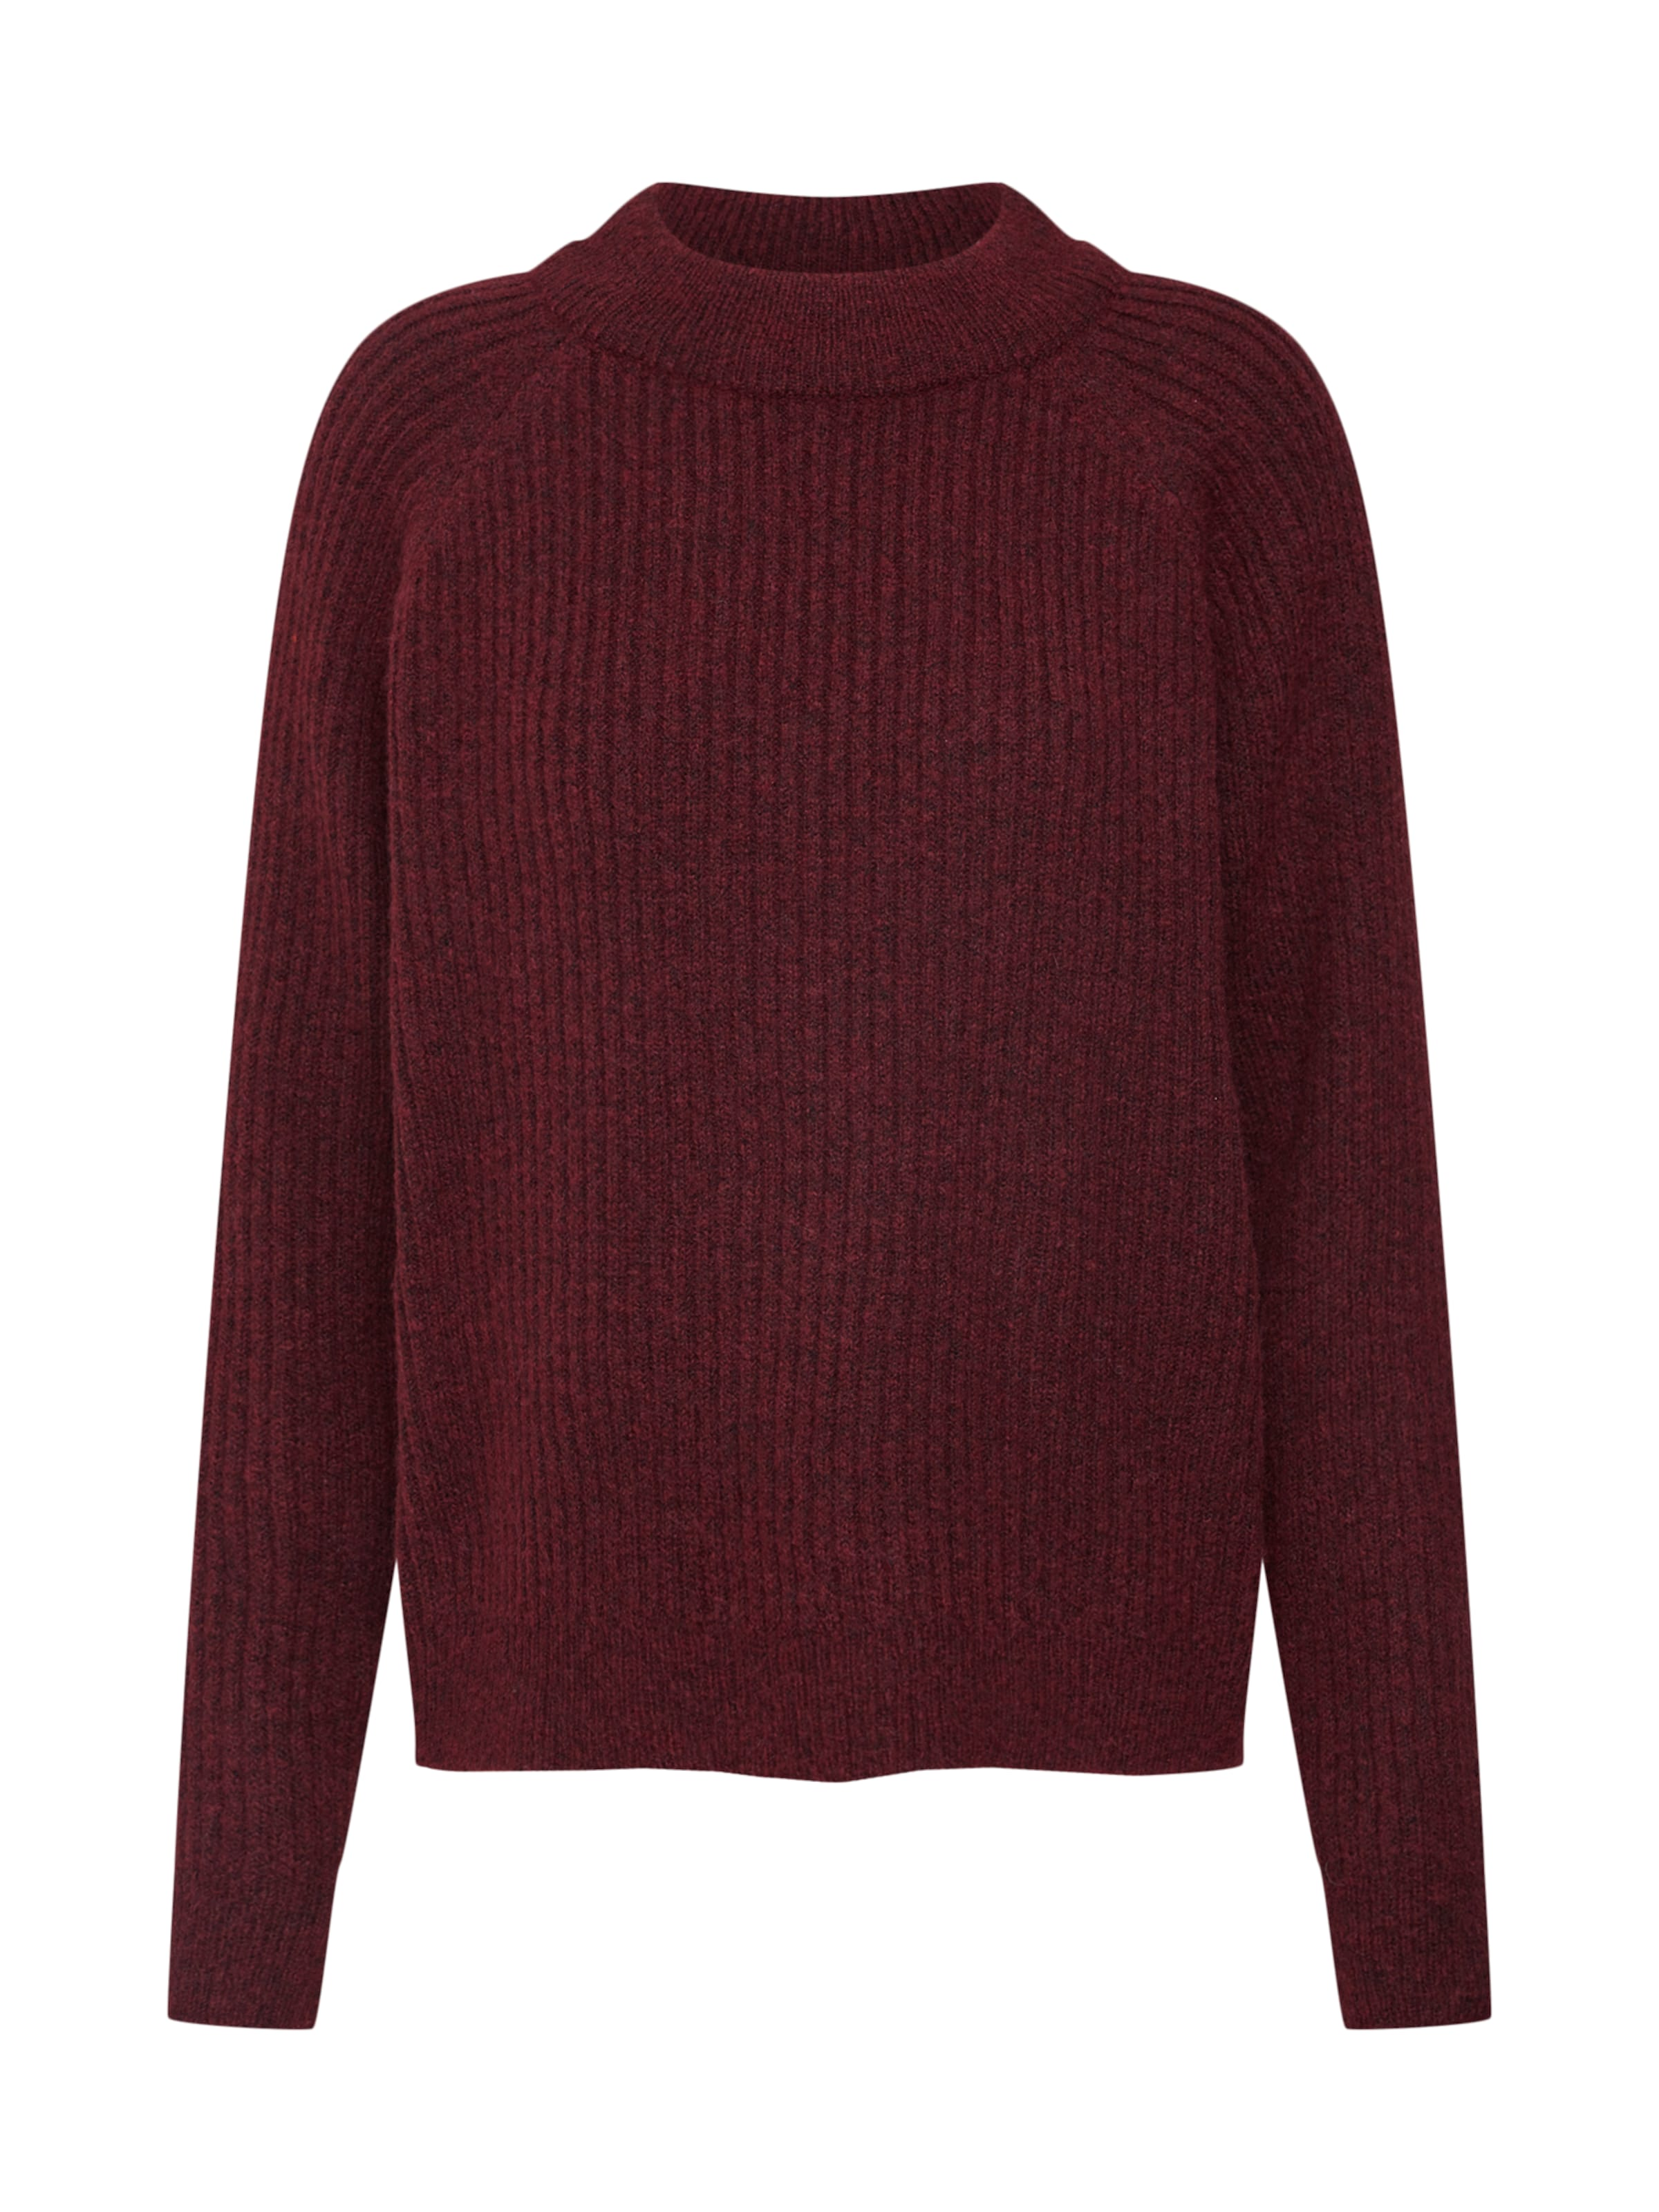 Bordeaux Saint Pull En 'rib over Knit Tropez Sweater' zpUqSVGM